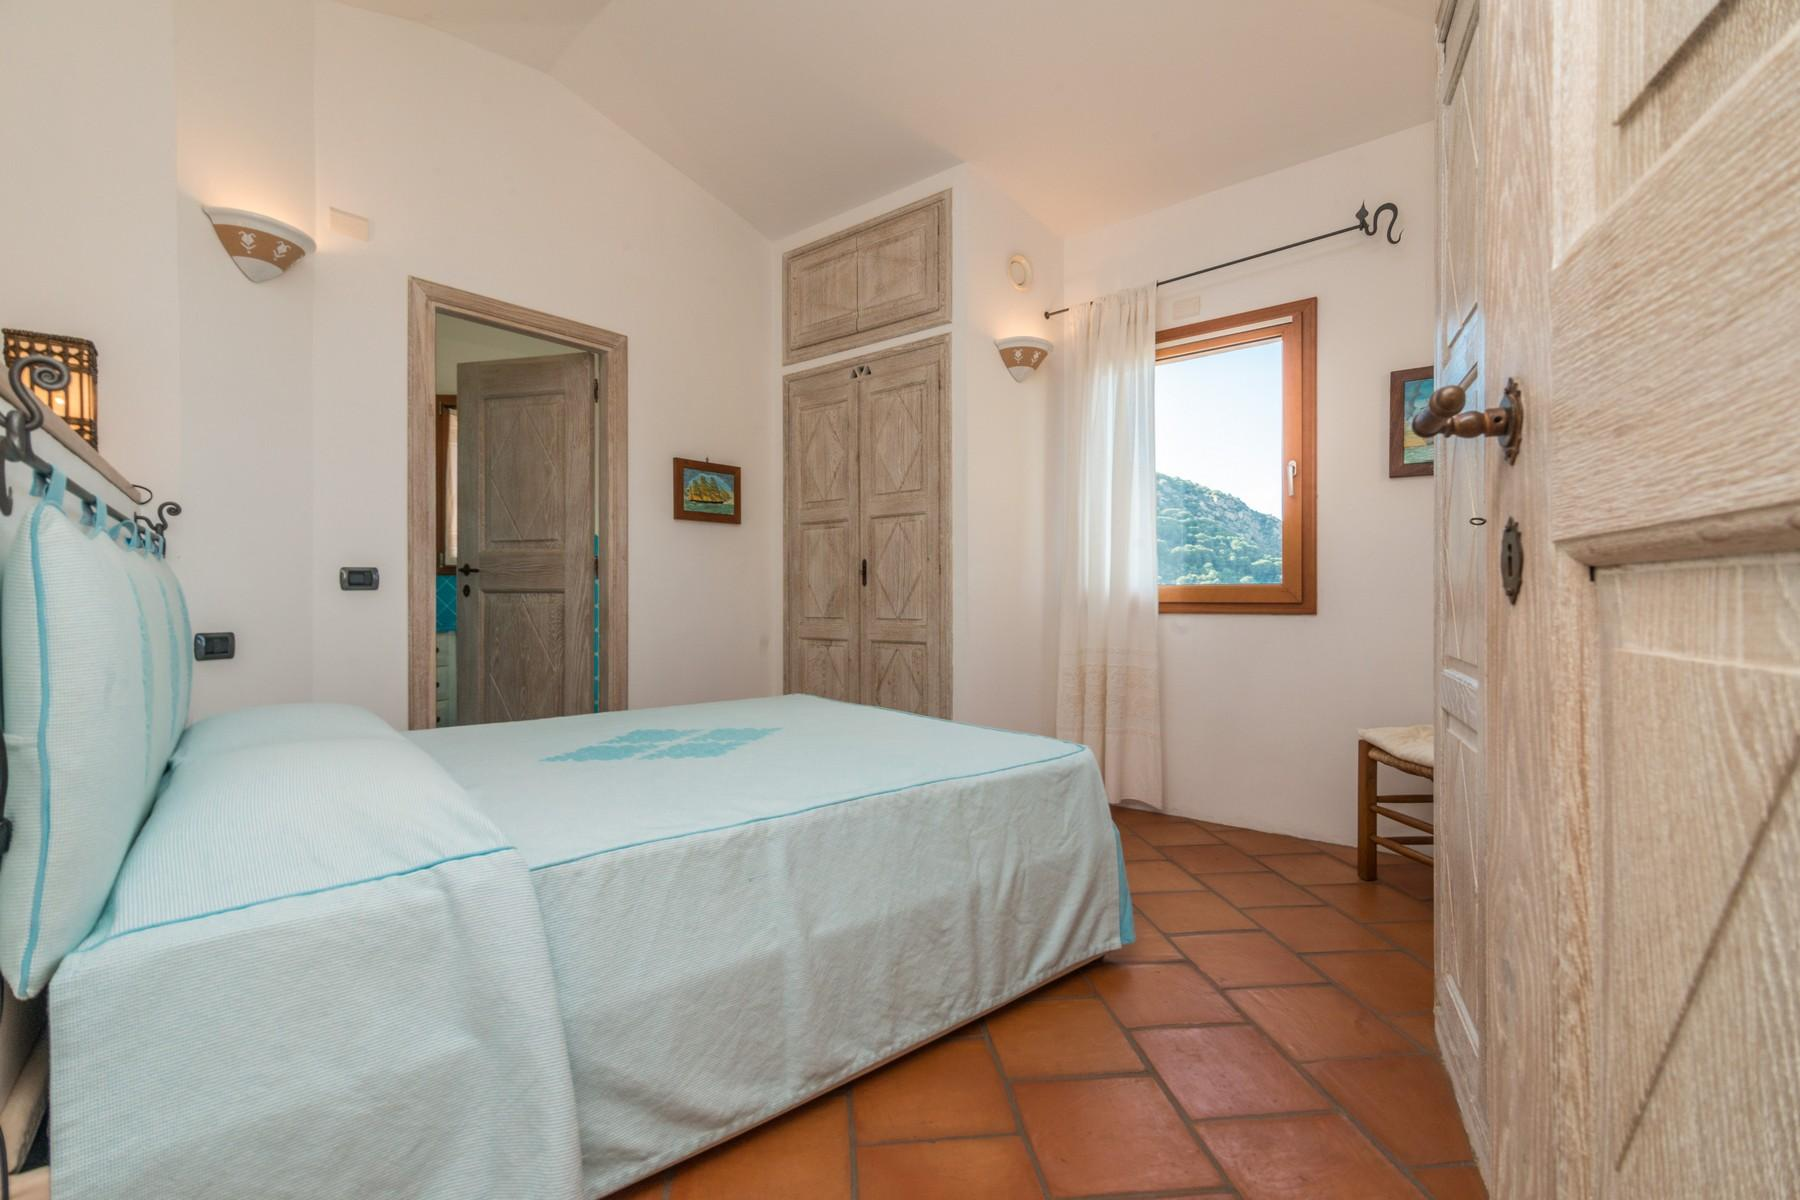 Abbiadori Отличный таунхаус с видом на море на холмах Сардинии, Италия - 24